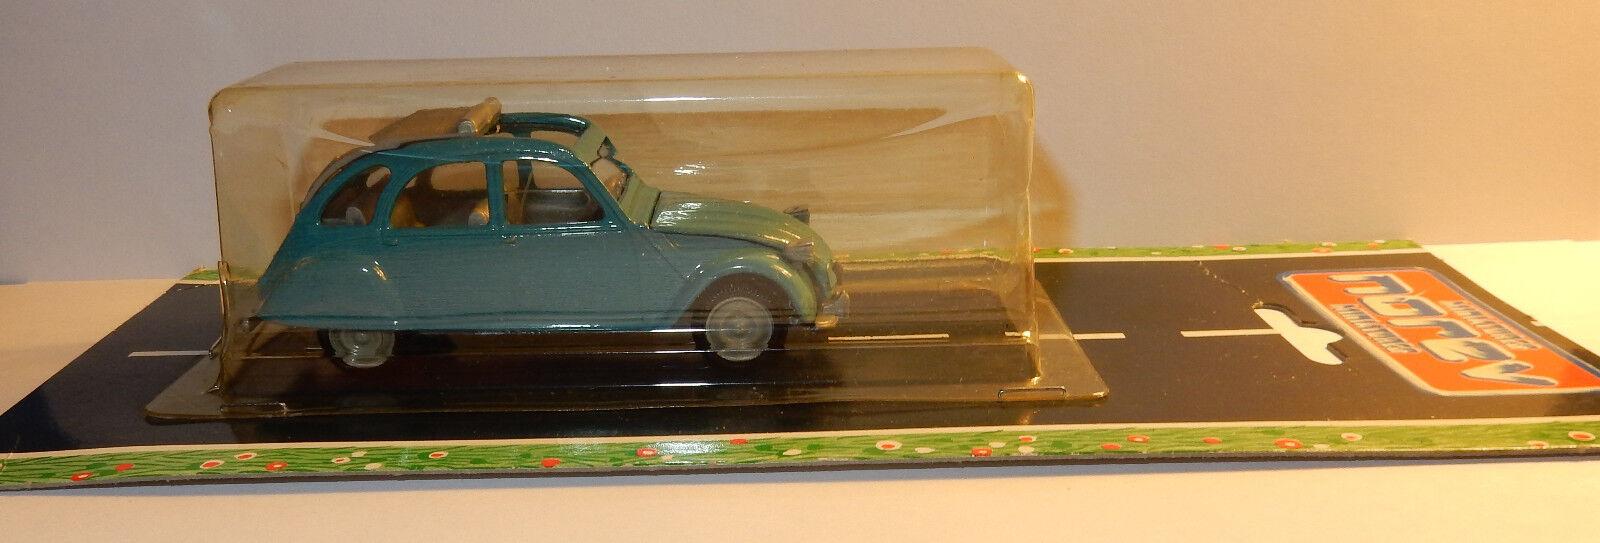 OLD NOREV JET CAR MADE IN FRANCE FRANCE FRANCE 1985 CITROEN 2CV 1974 1981 bluee 1 43 blister a8eb63